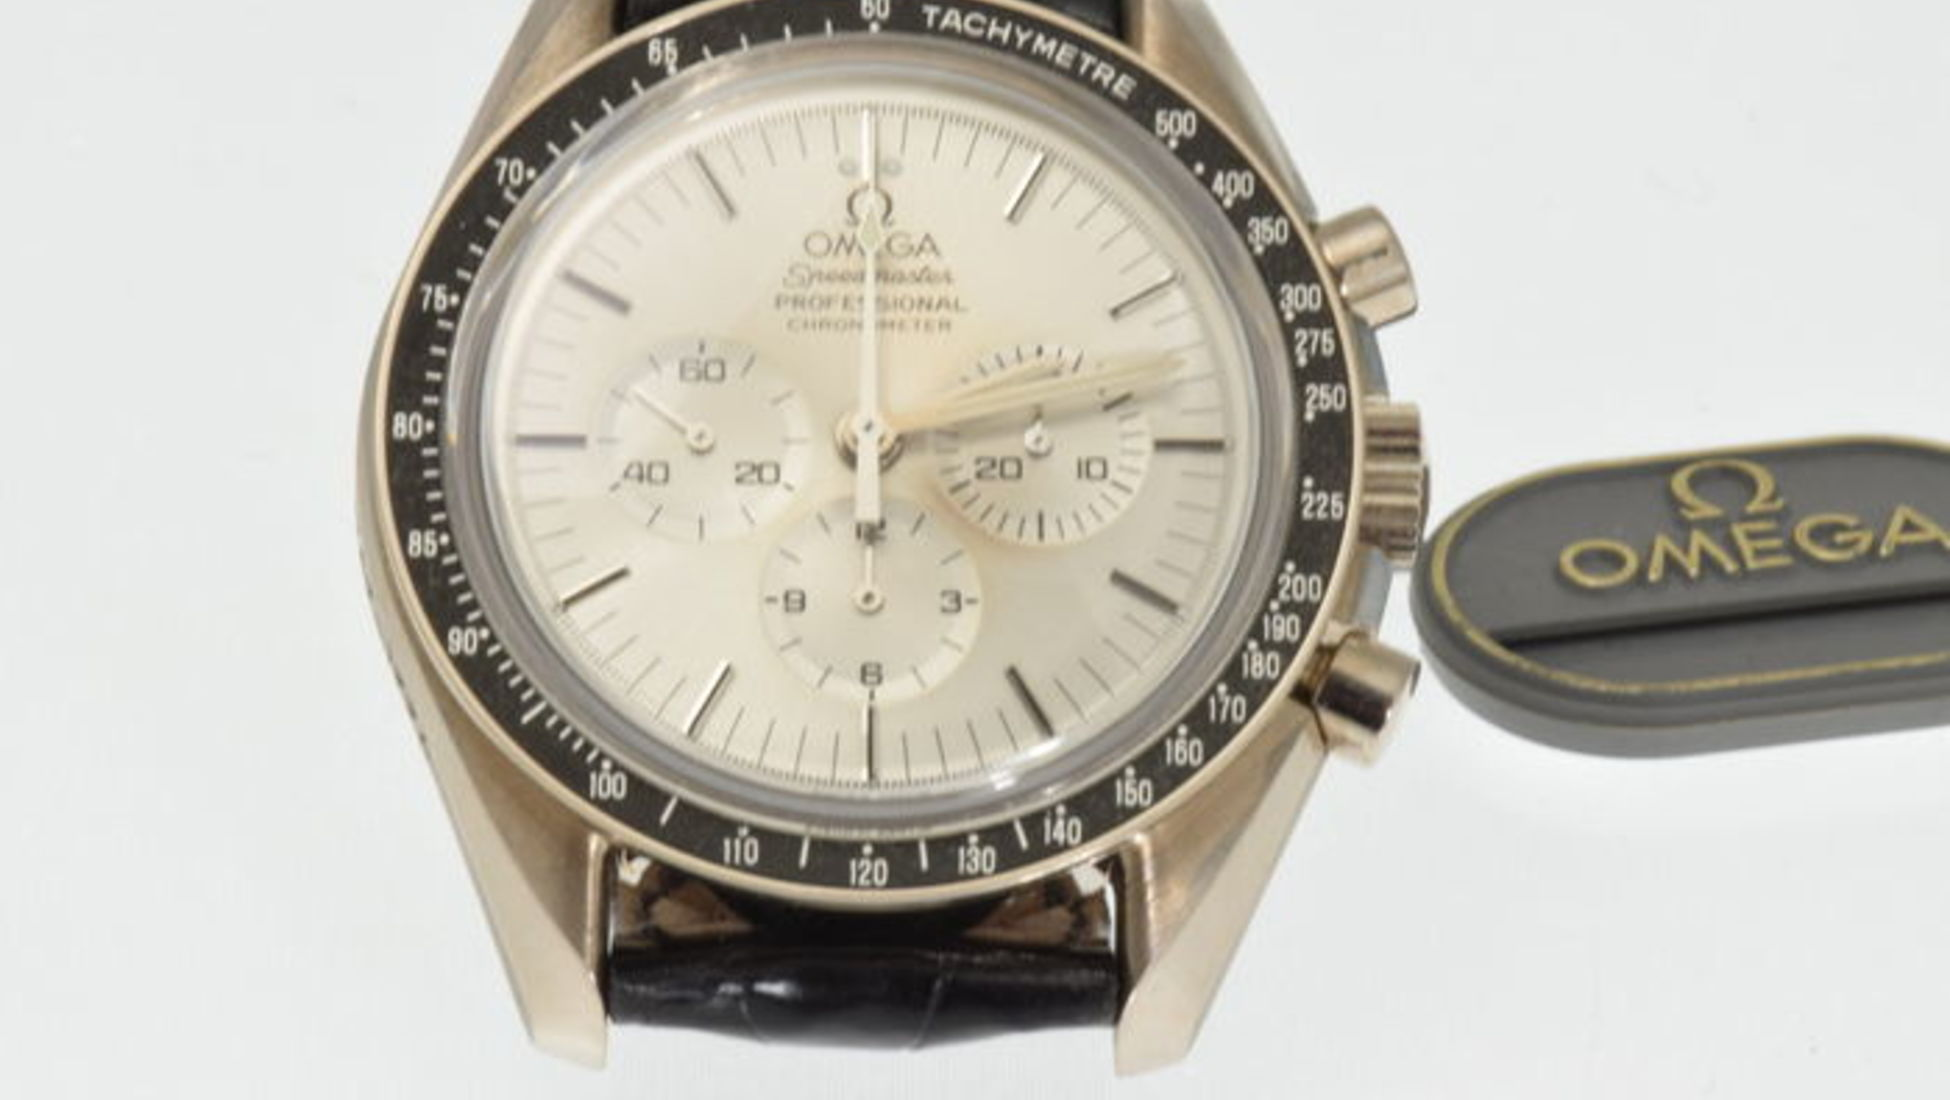 Por qué deberías invertir en un reloj Omega antiguo hoy mismo - Catawiki 3d60f69c1eda